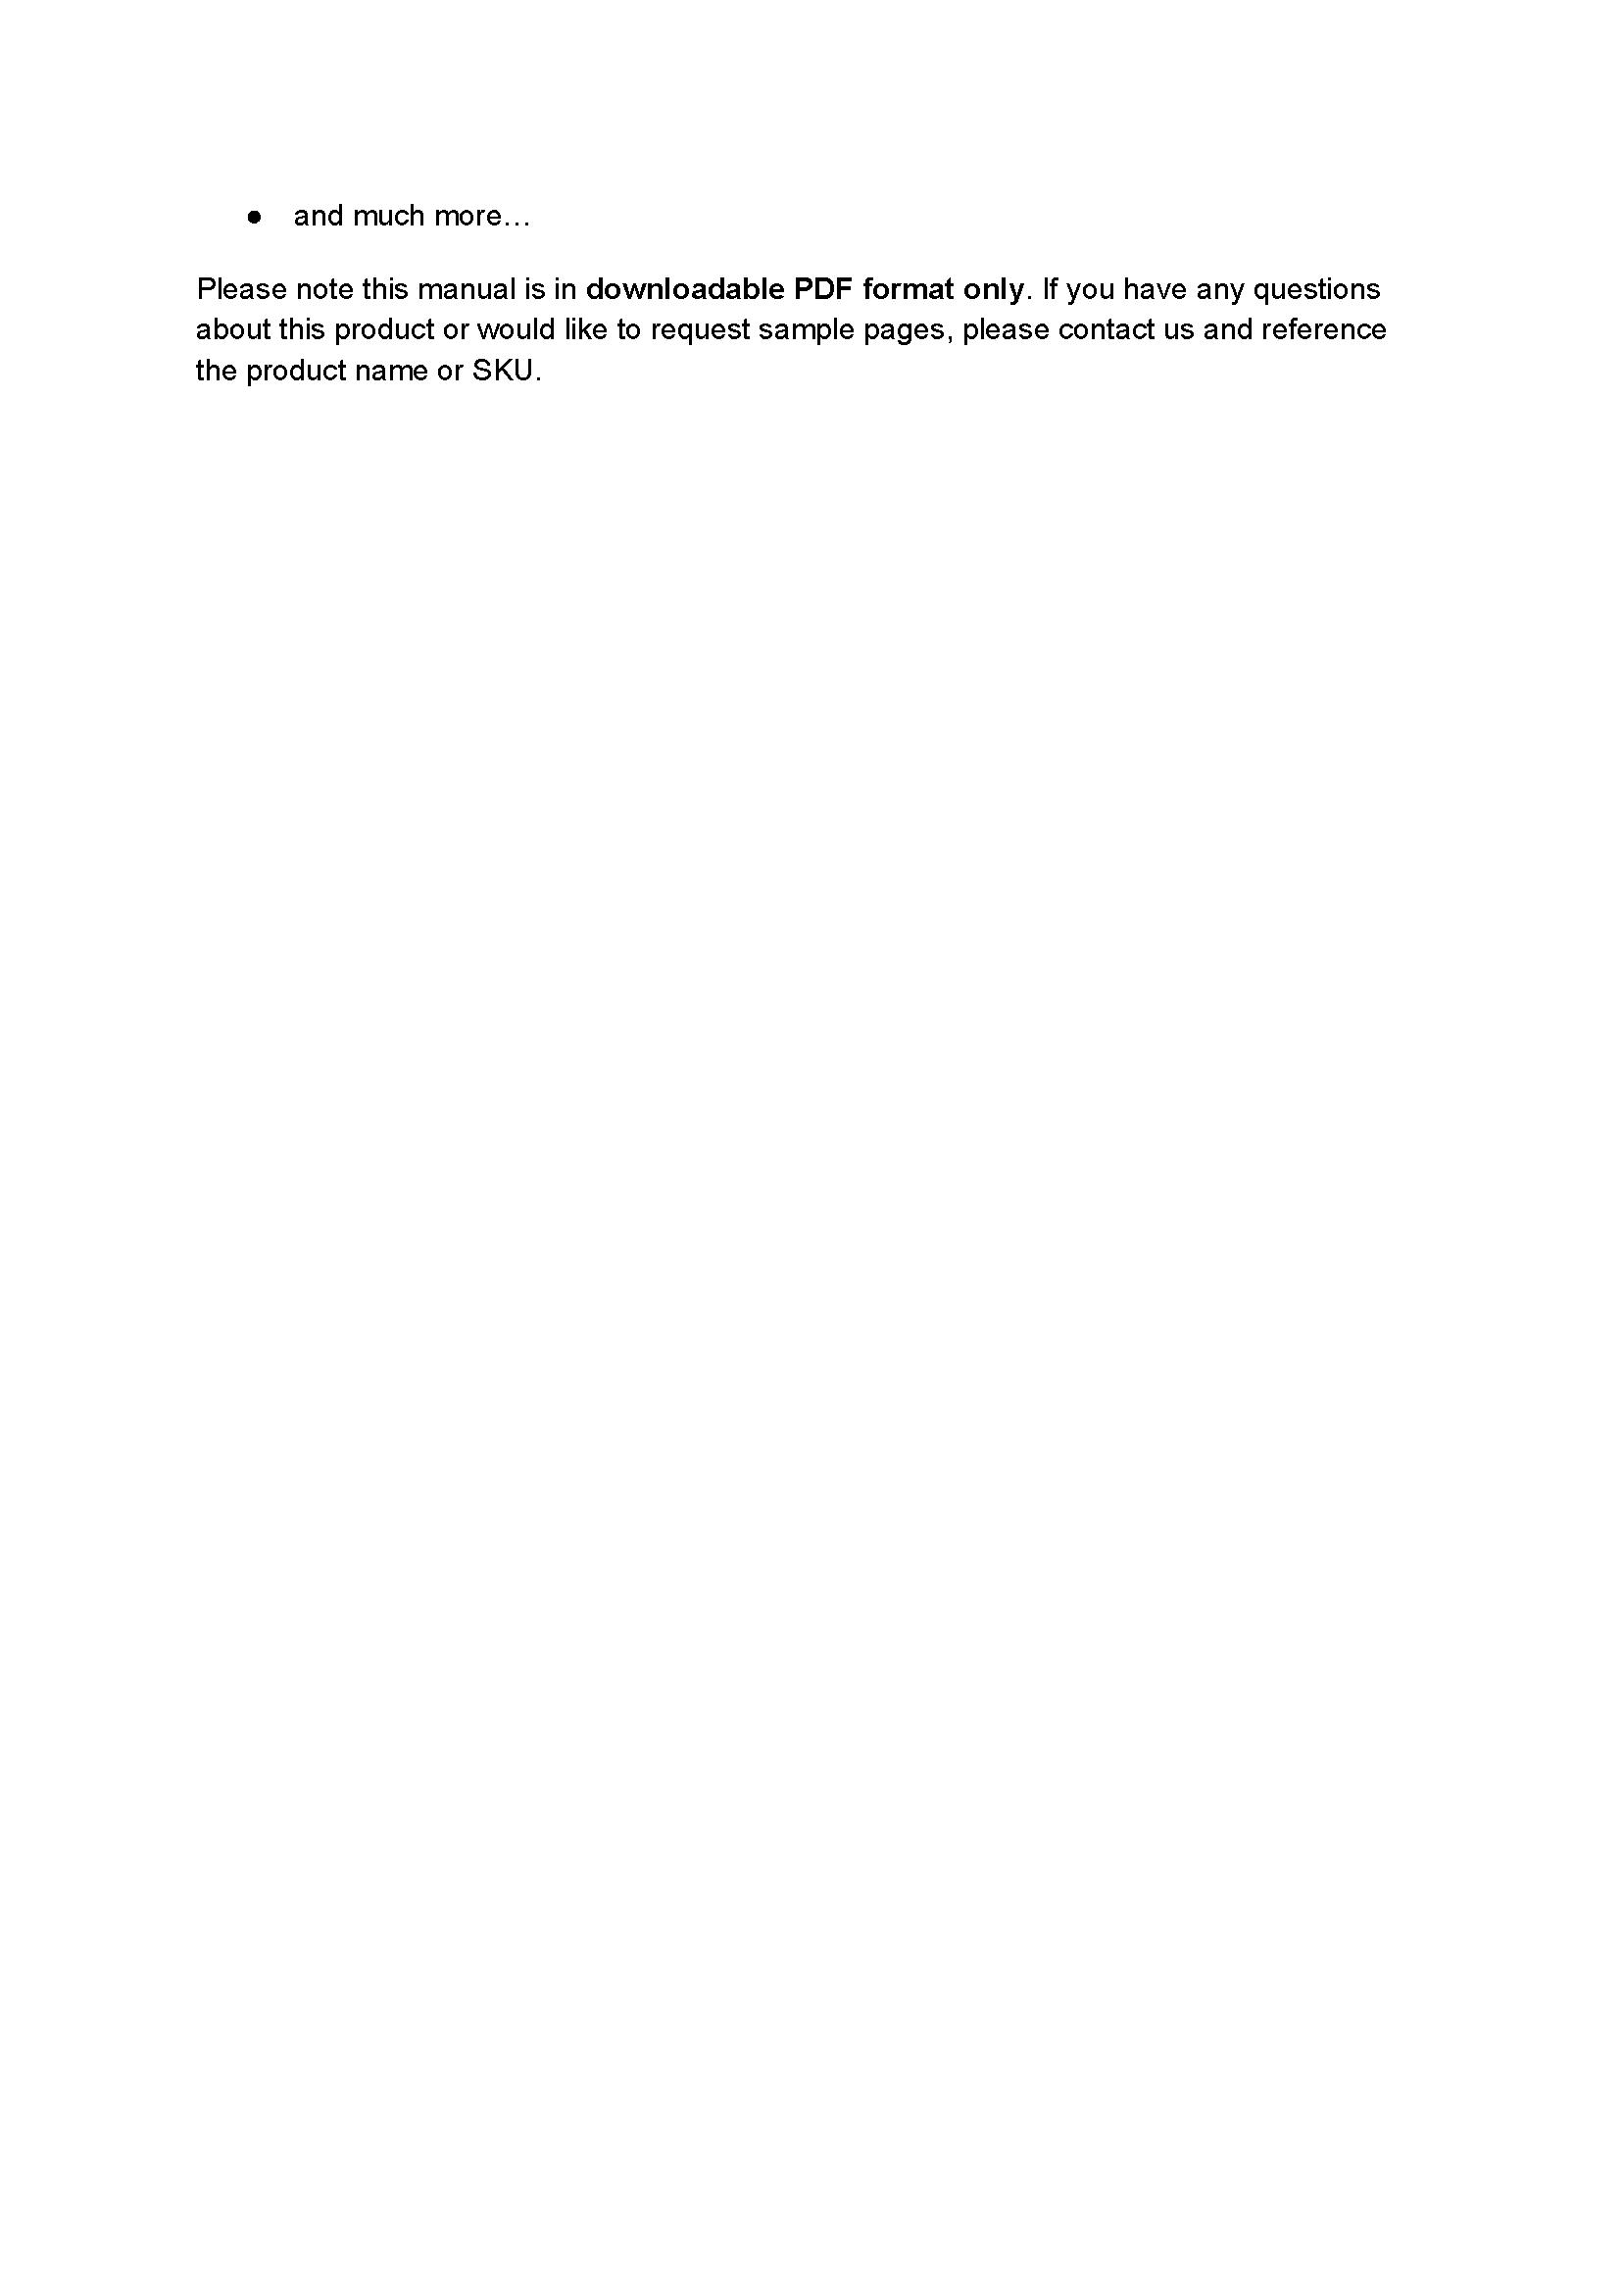 John Deere 2354HV manual